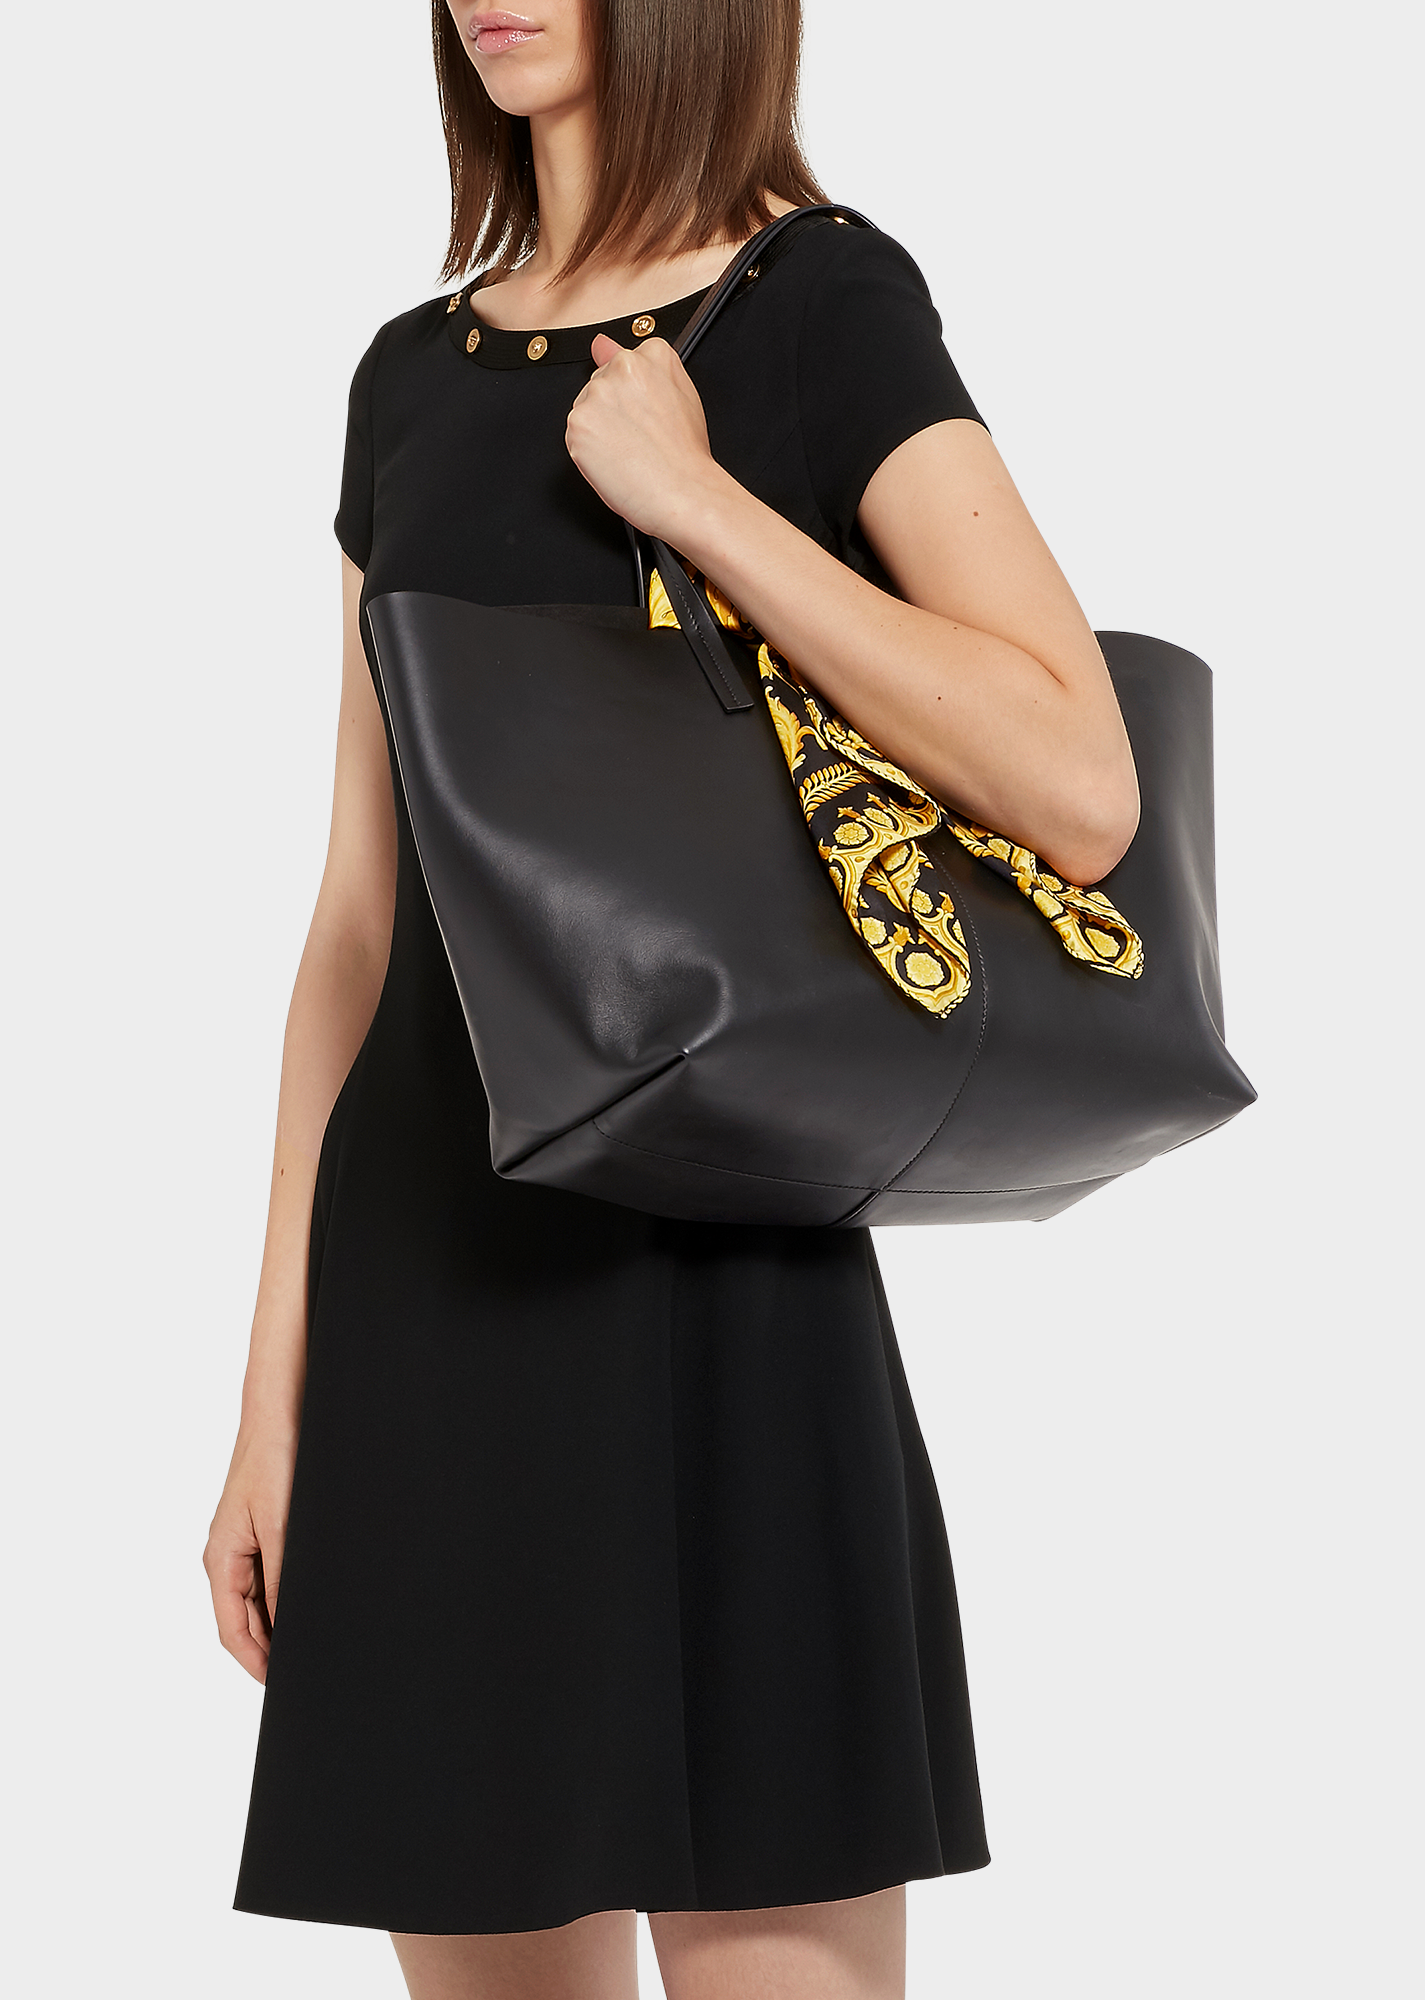 e799c2db46 Calf Leather Shoulder Tote Bag With Barocco Scarf in Black Multi Tribute  Gold